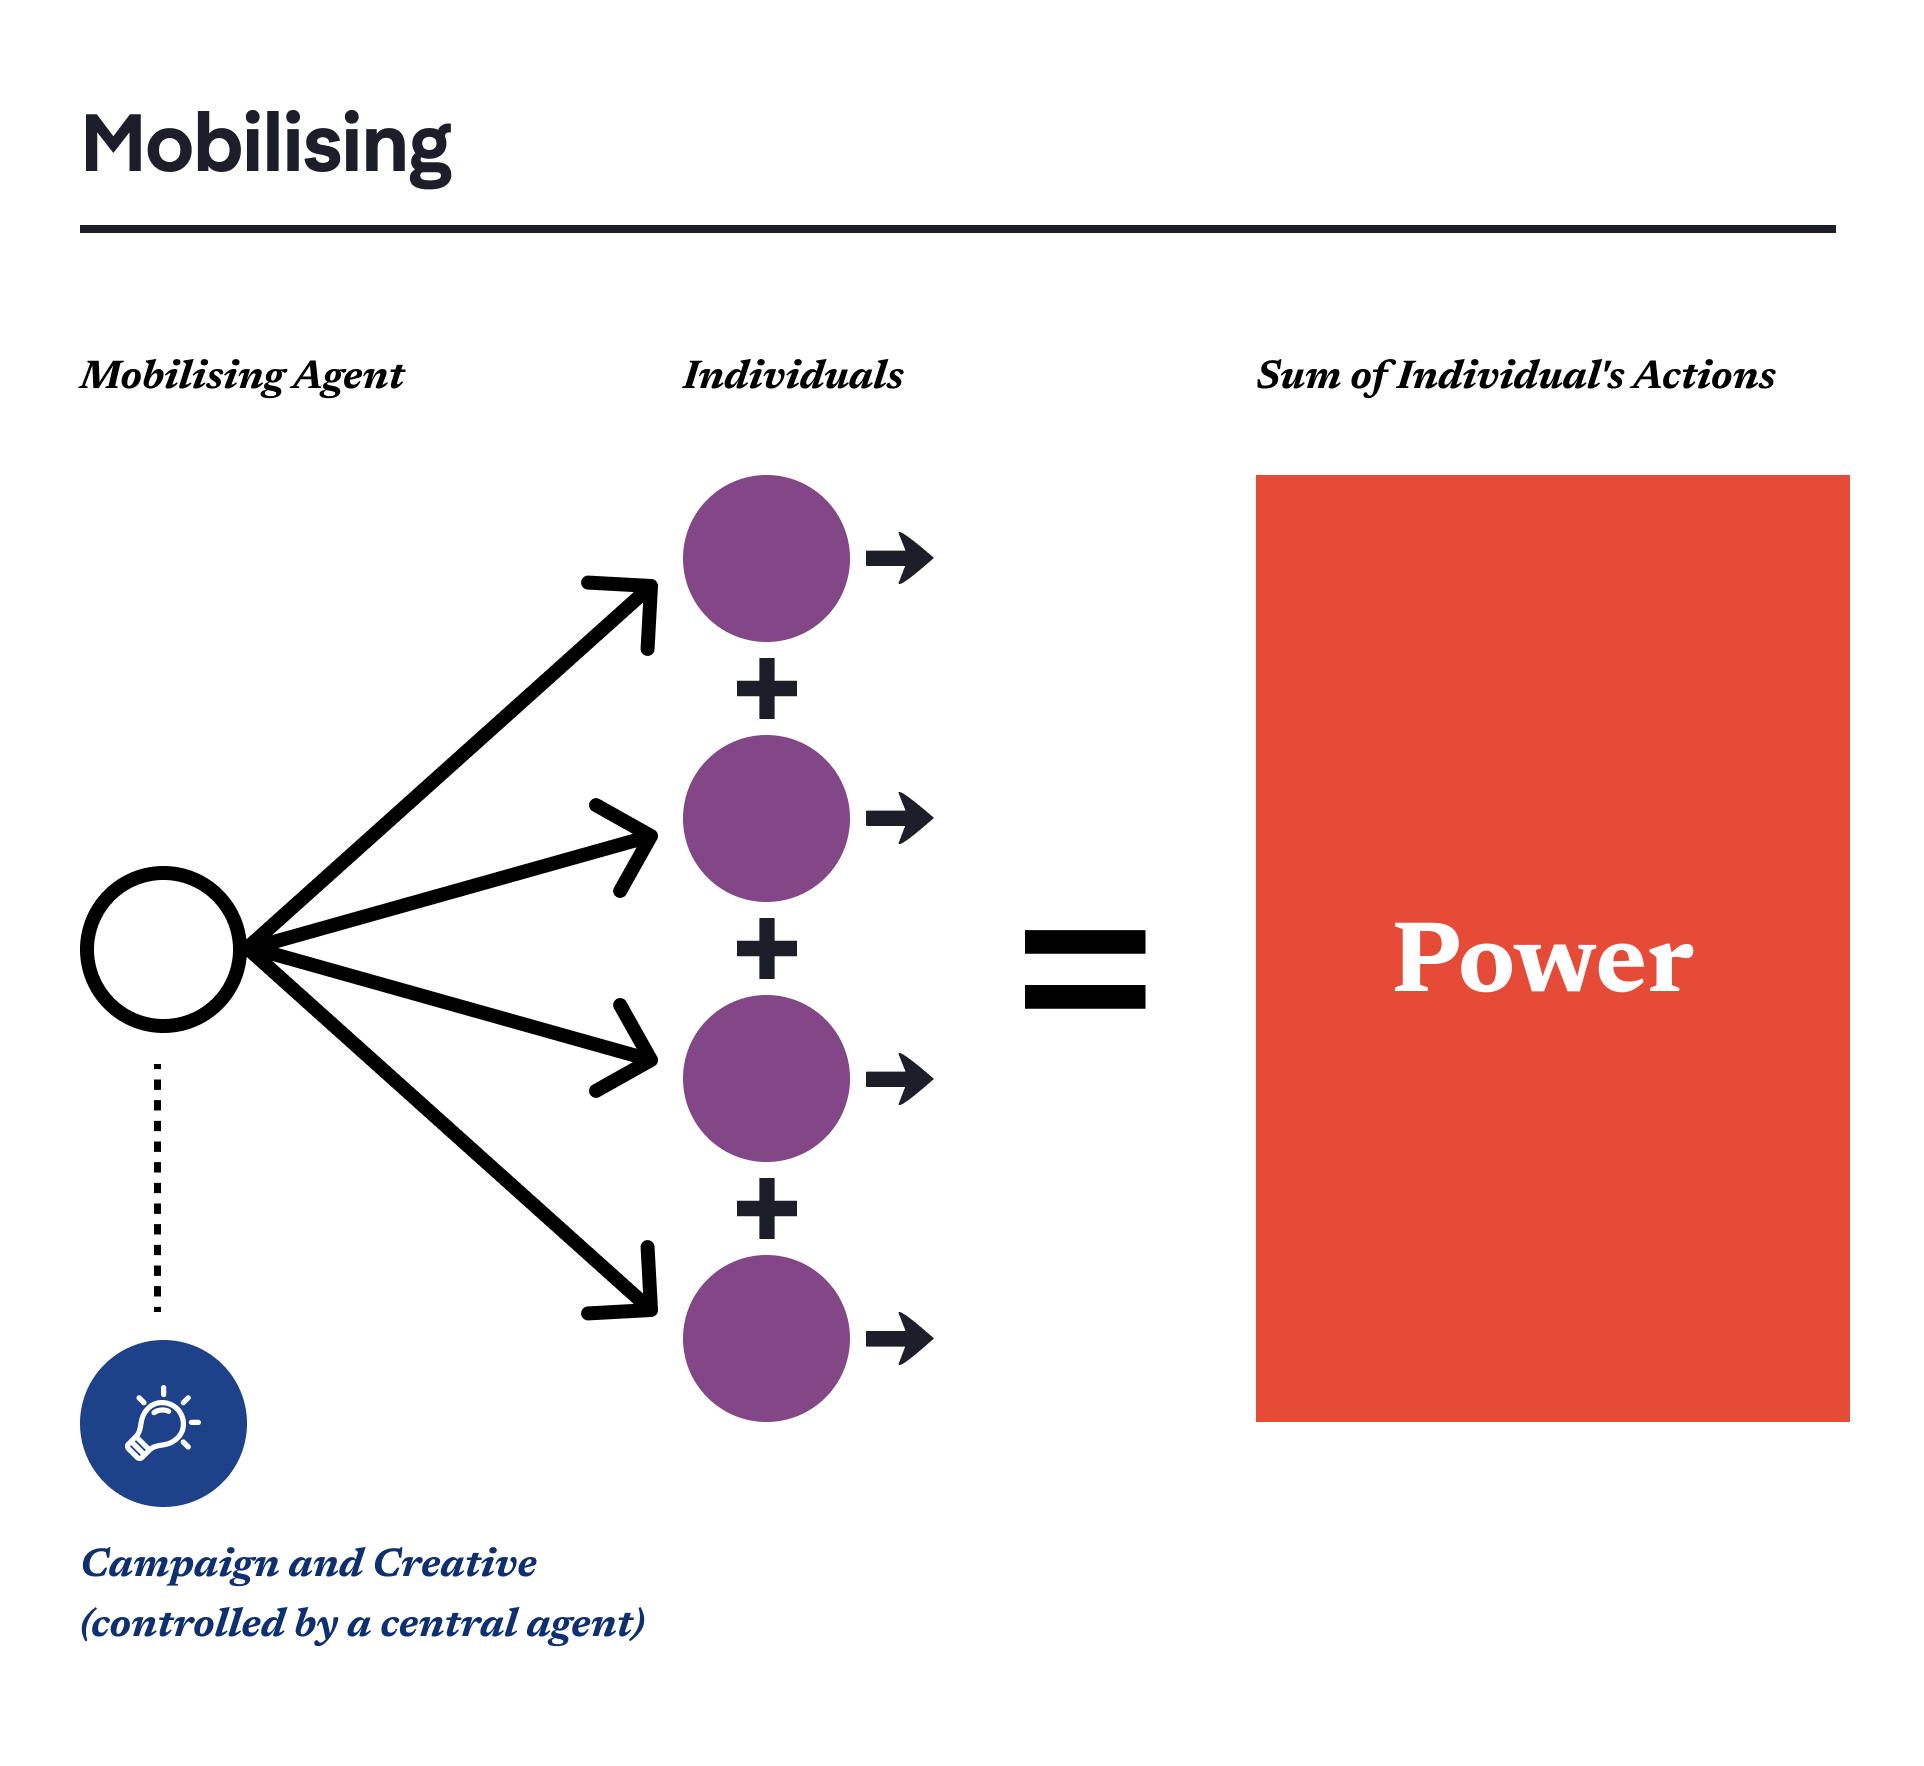 Tectonica - Digital Mobilising